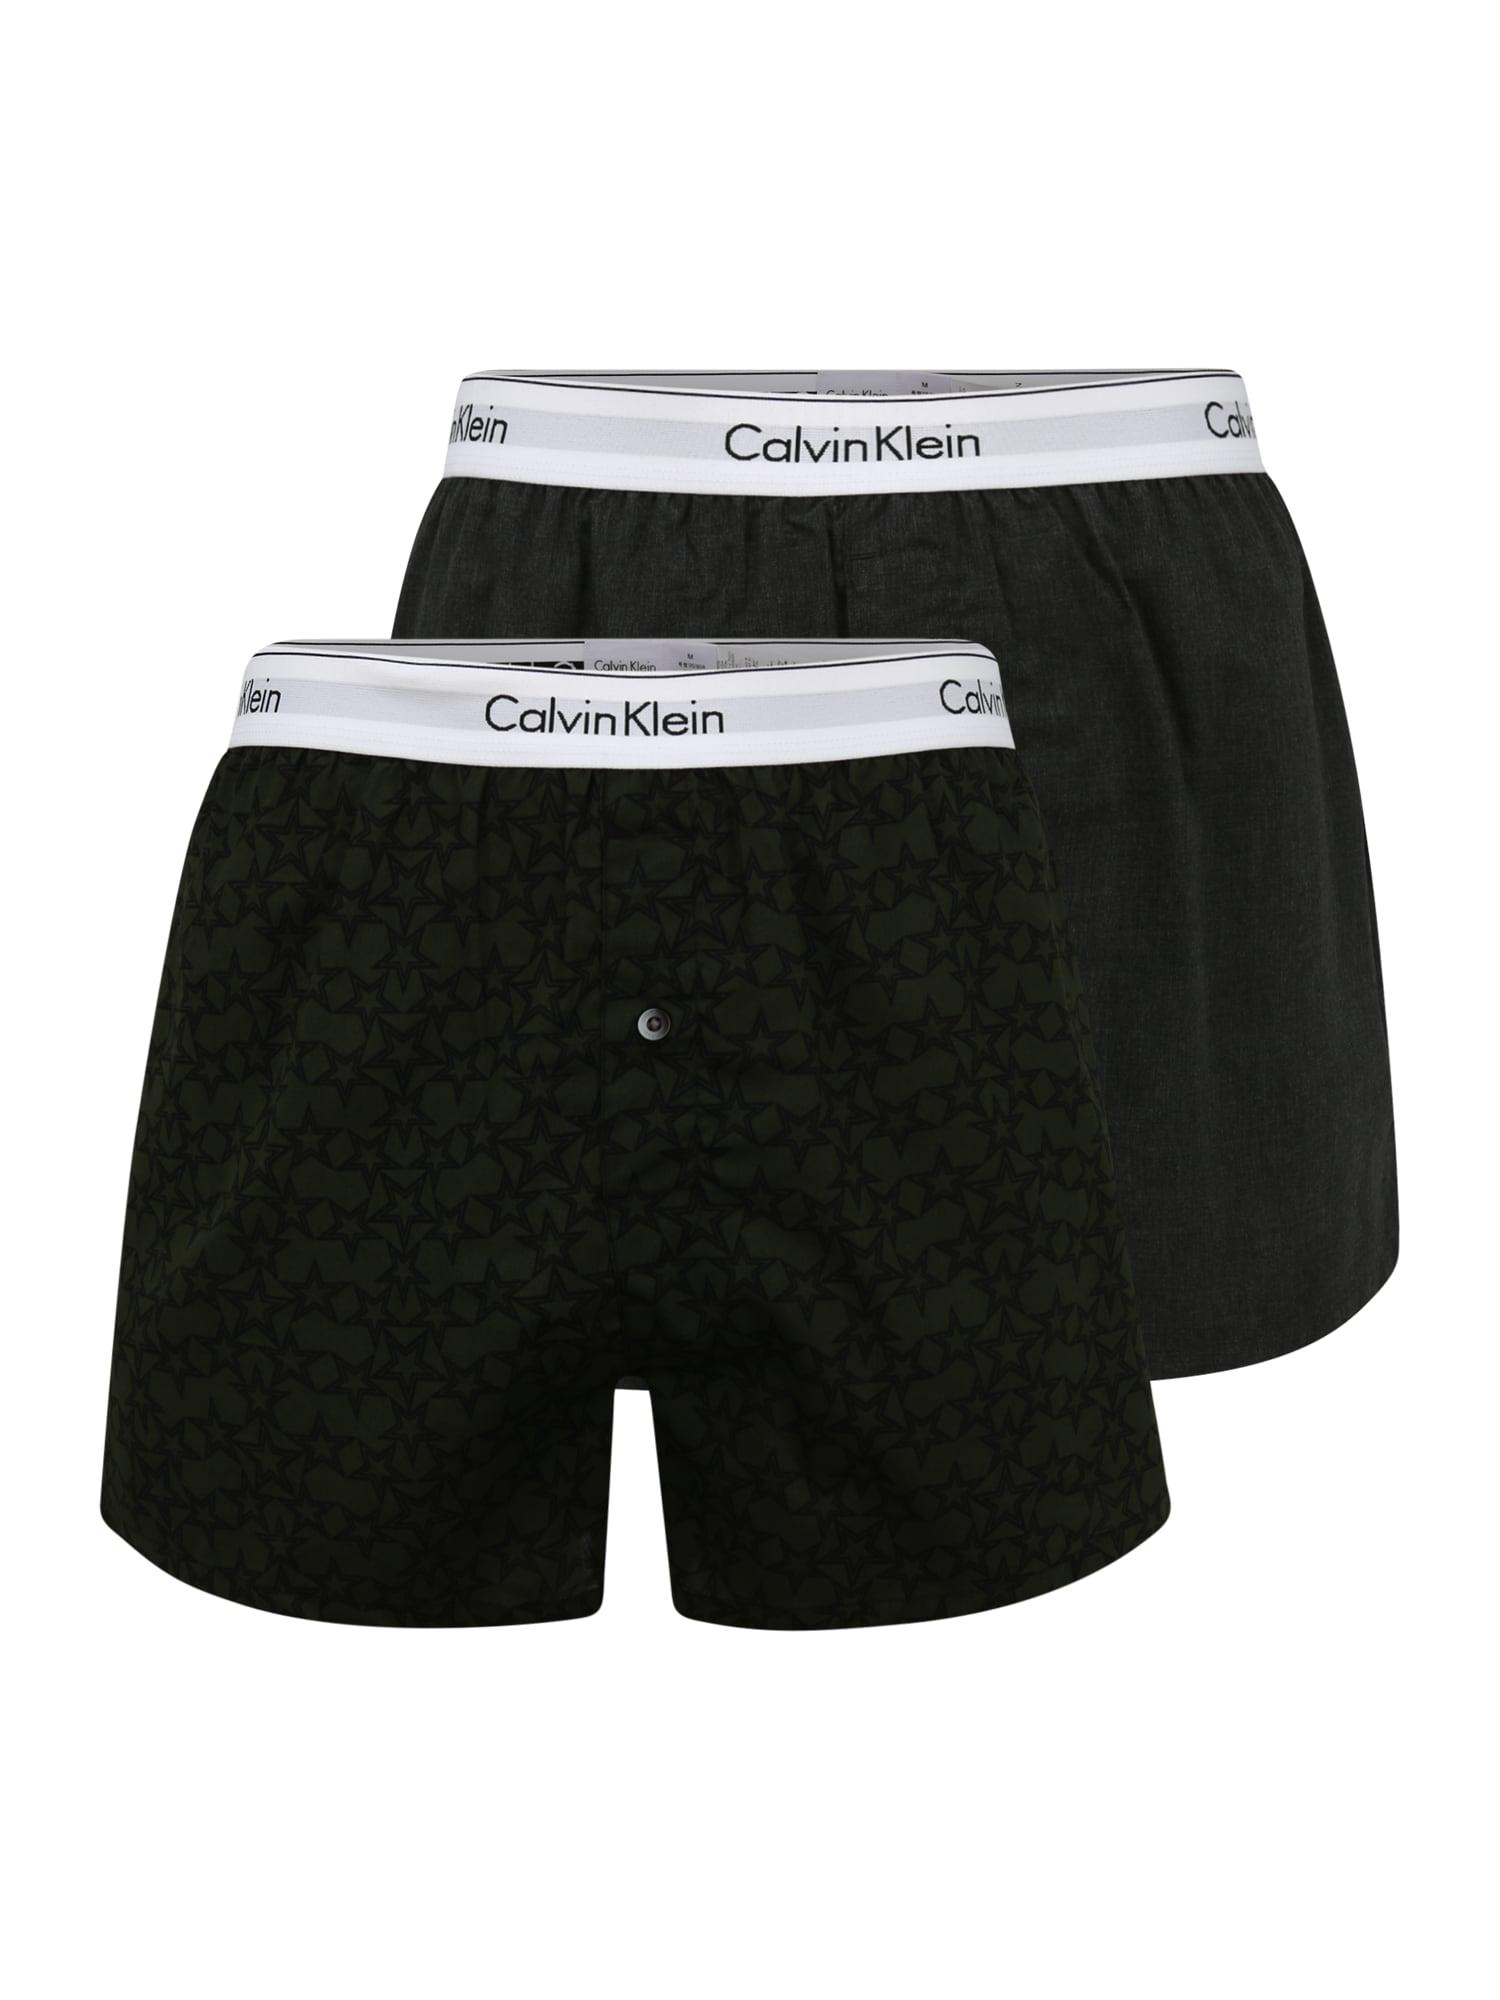 Calvin Klein Underwear Boxer trumpikės margai pilka / tamsiai žalia / juoda